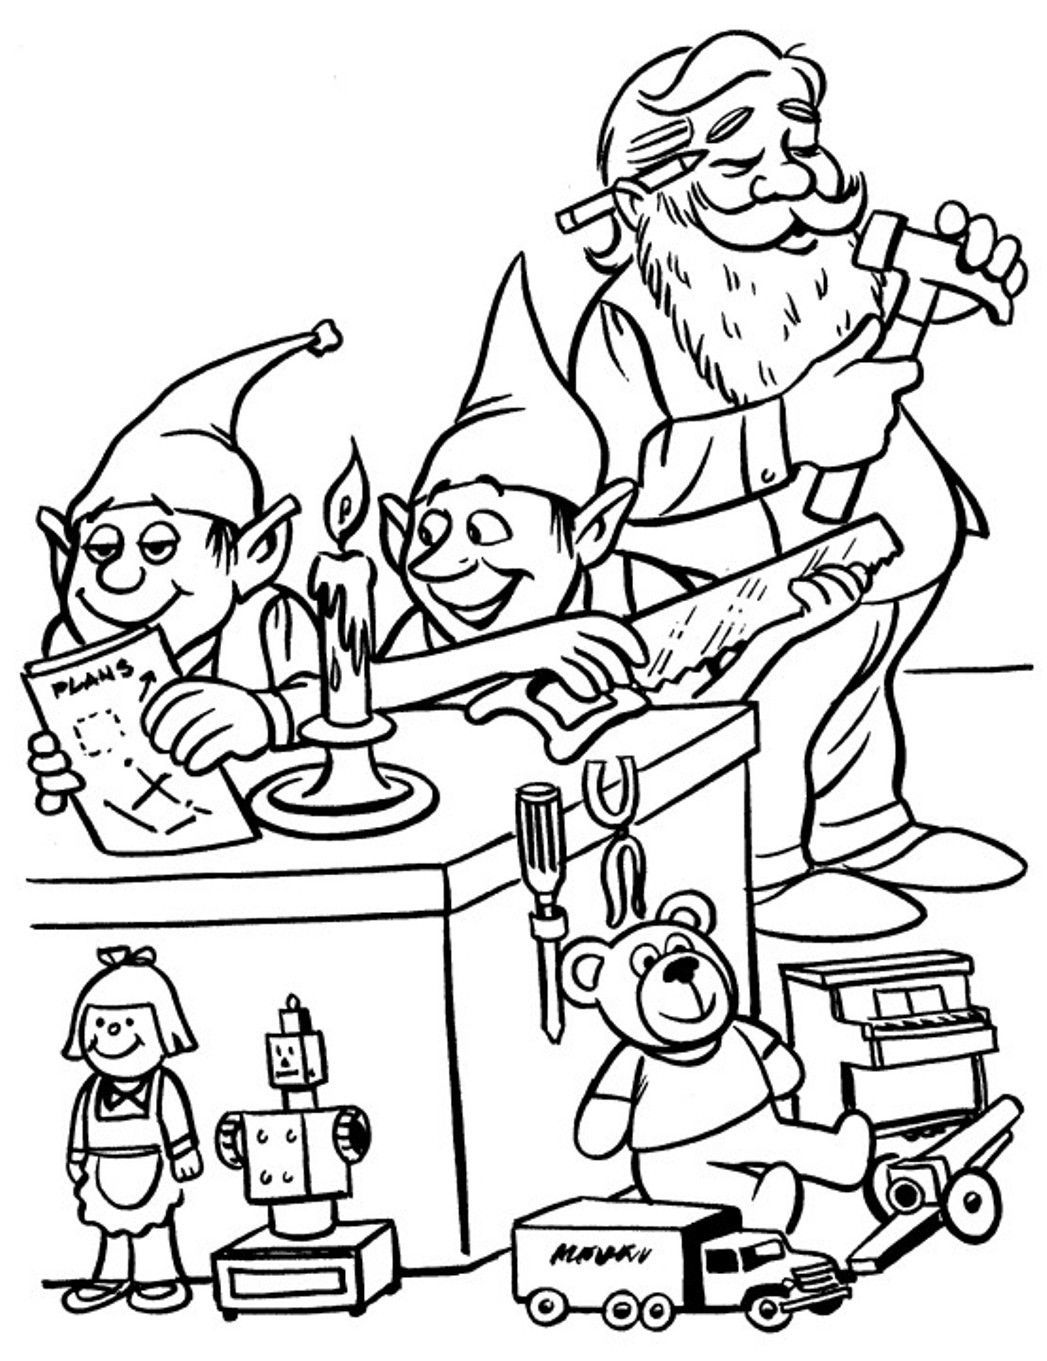 Santa Coloring Pages Santa coloring pages, Christmas